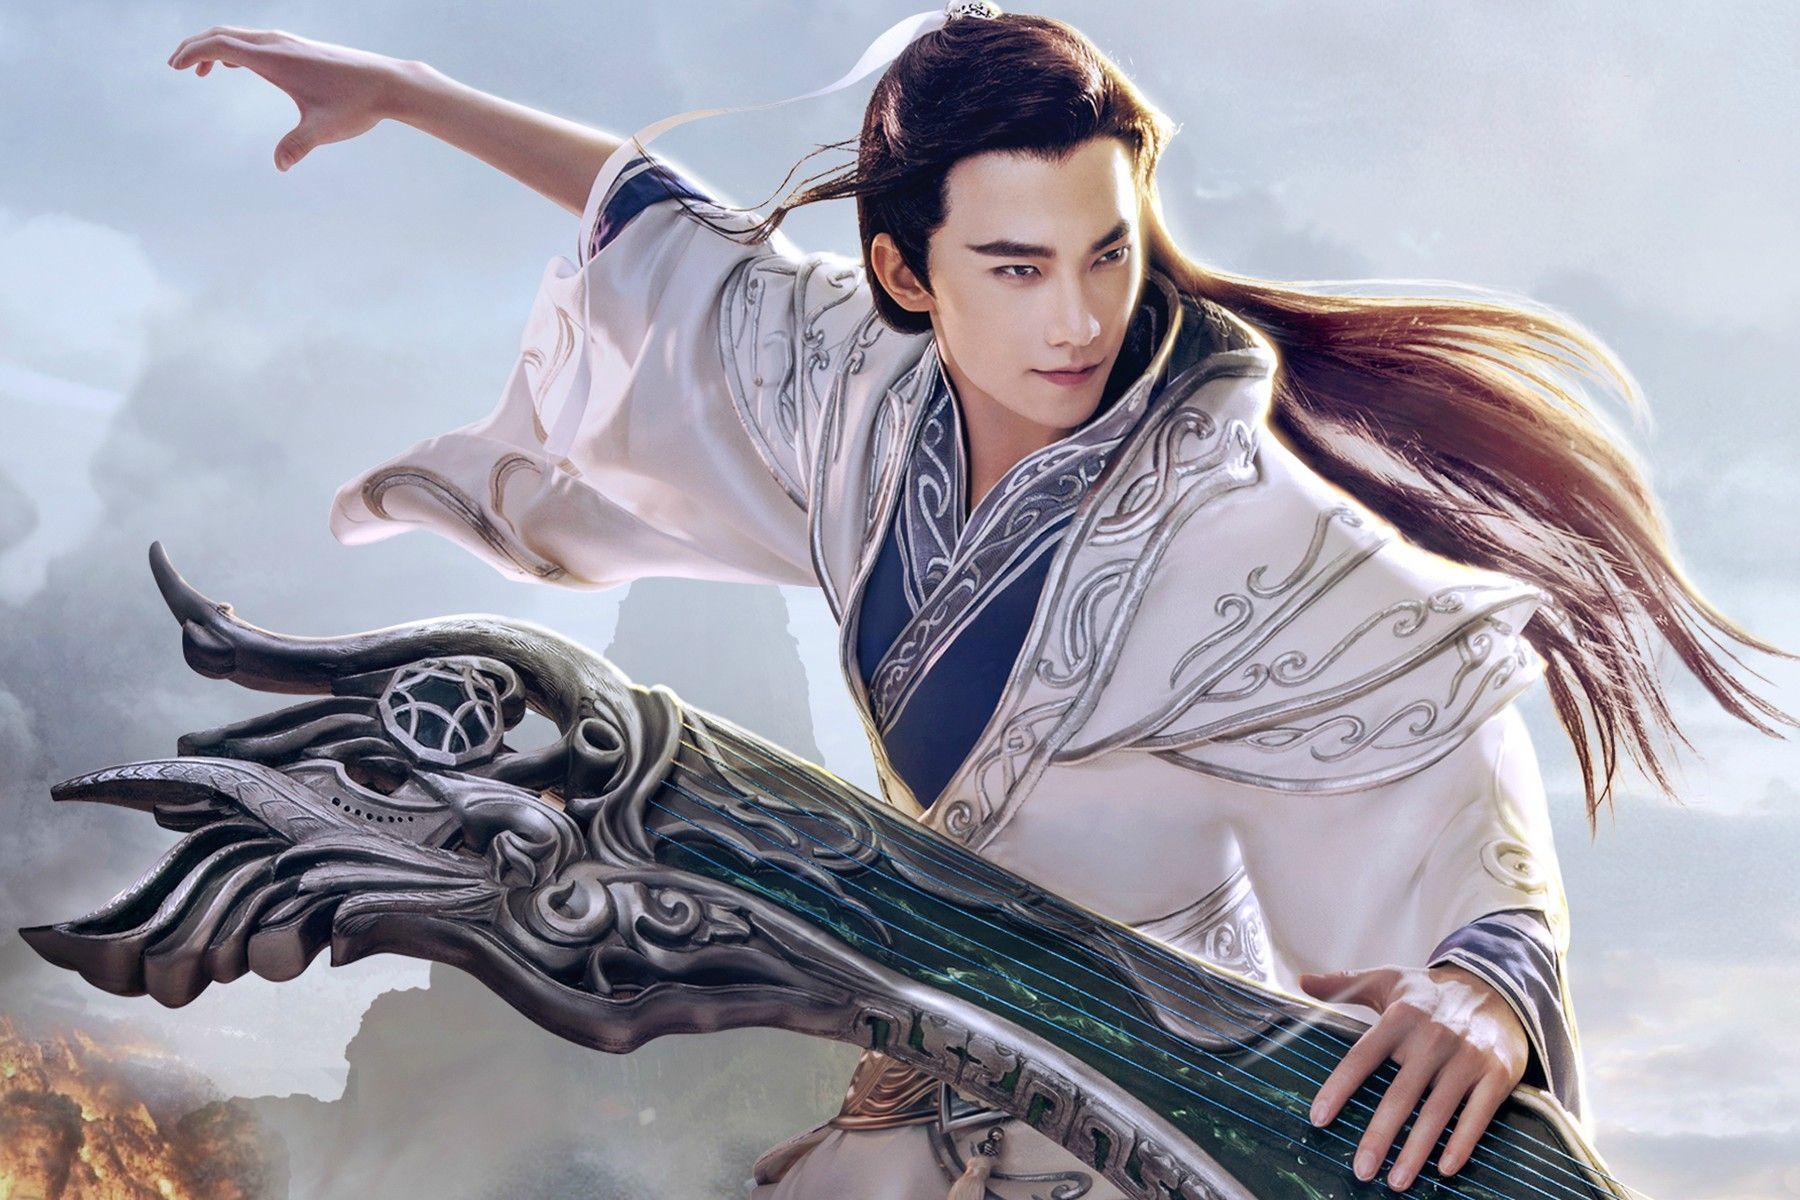 倩女幽魂手游_看图_杨洋吧_百度贴吧 Handsome, Chinese actress, Yang yang